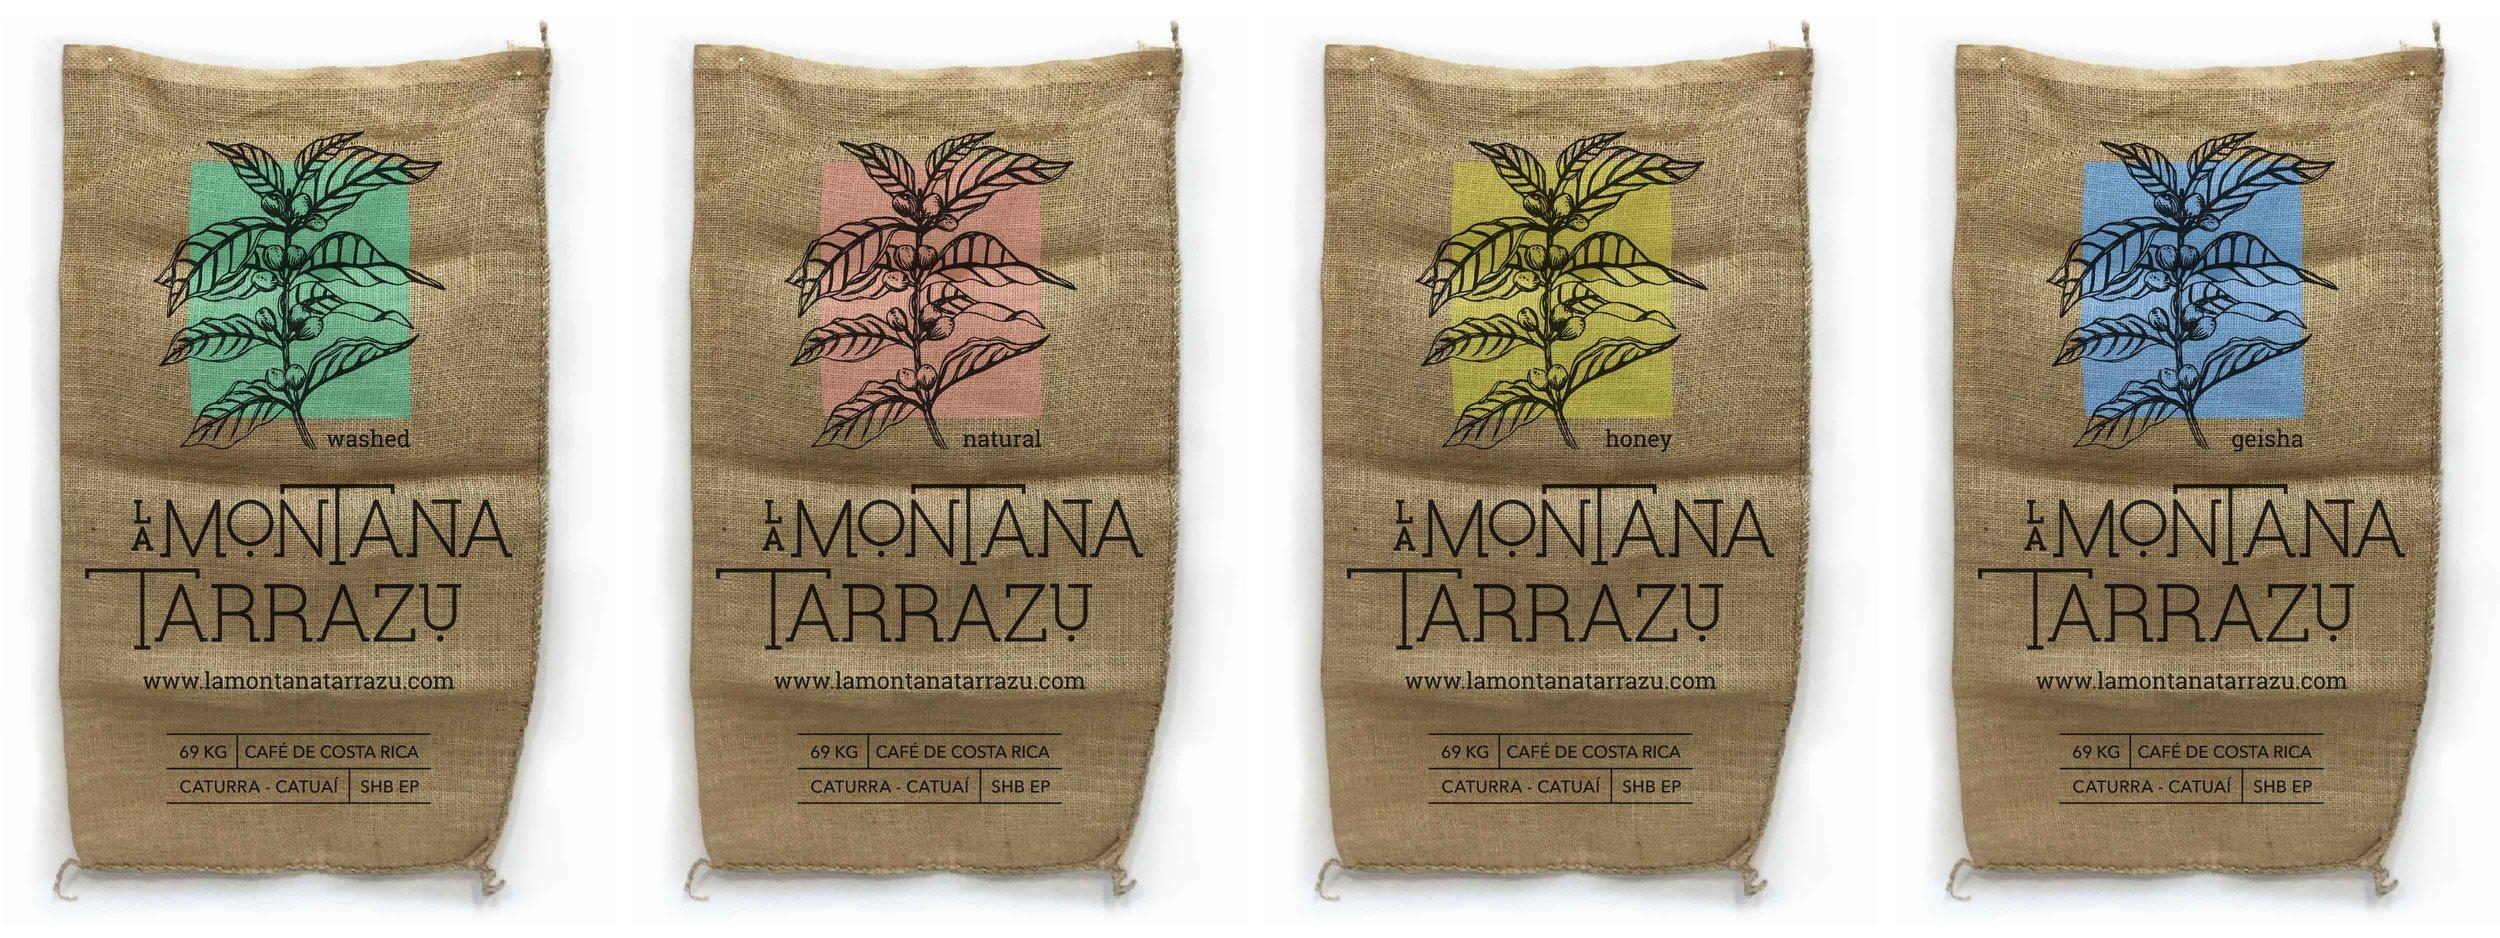 Green coffee export bags